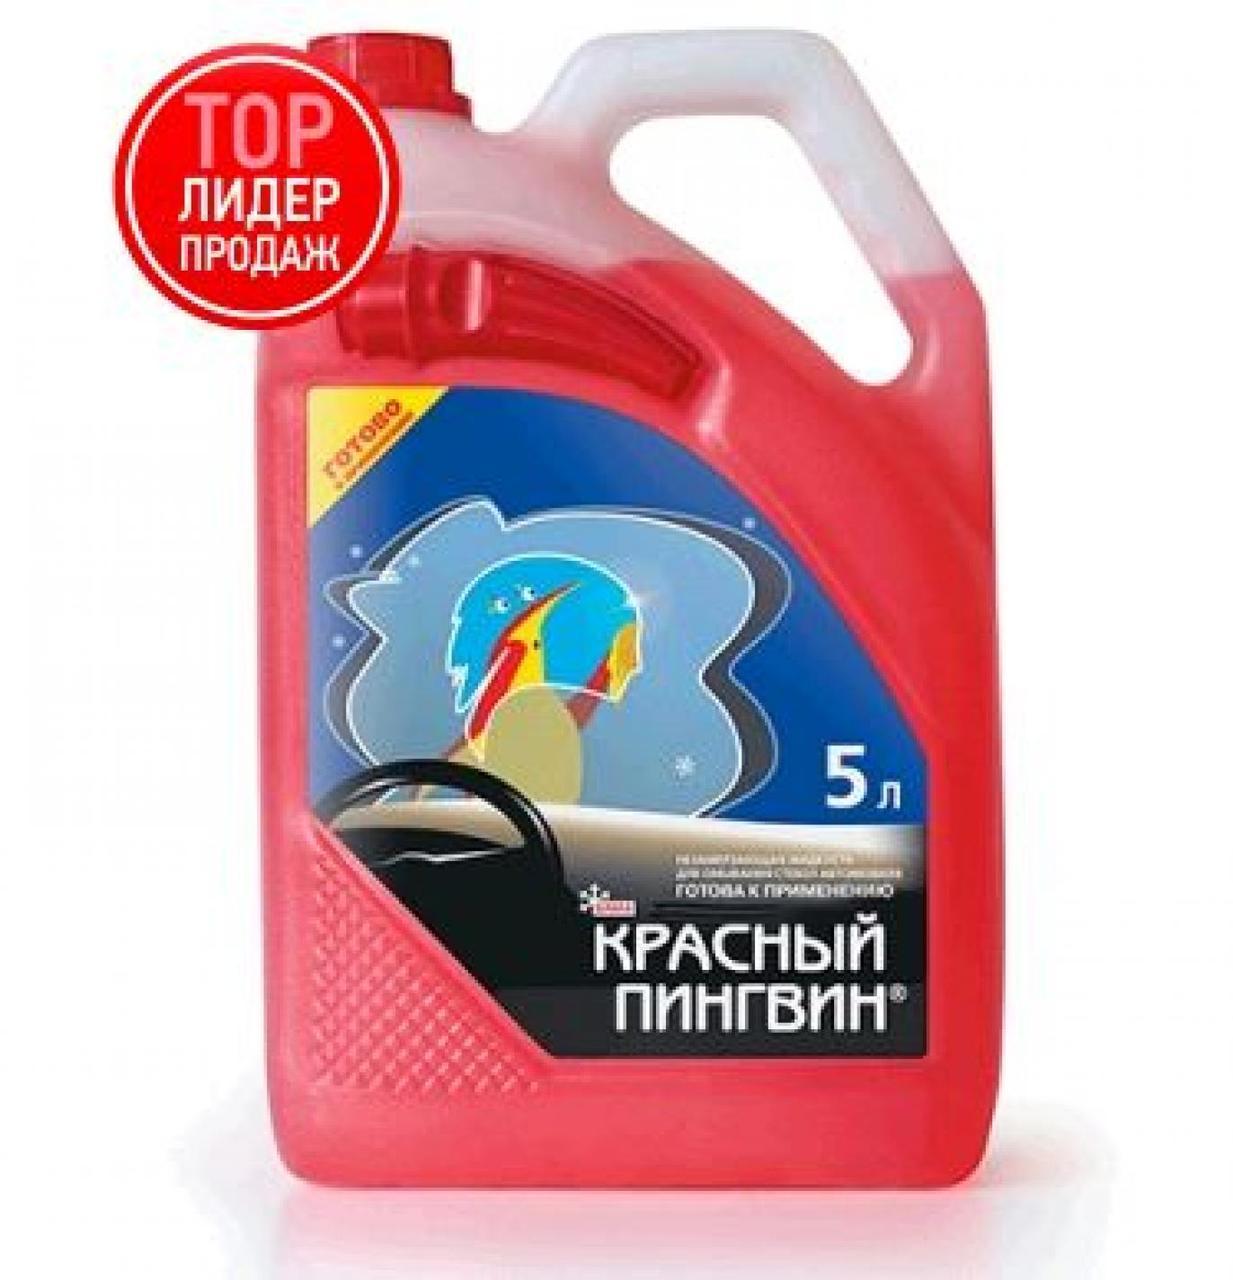 Очиститель стекол авто 5л (канистра, ЗИМА -22 С) RED PENGUIN (XB 50304) (#ХАДО)